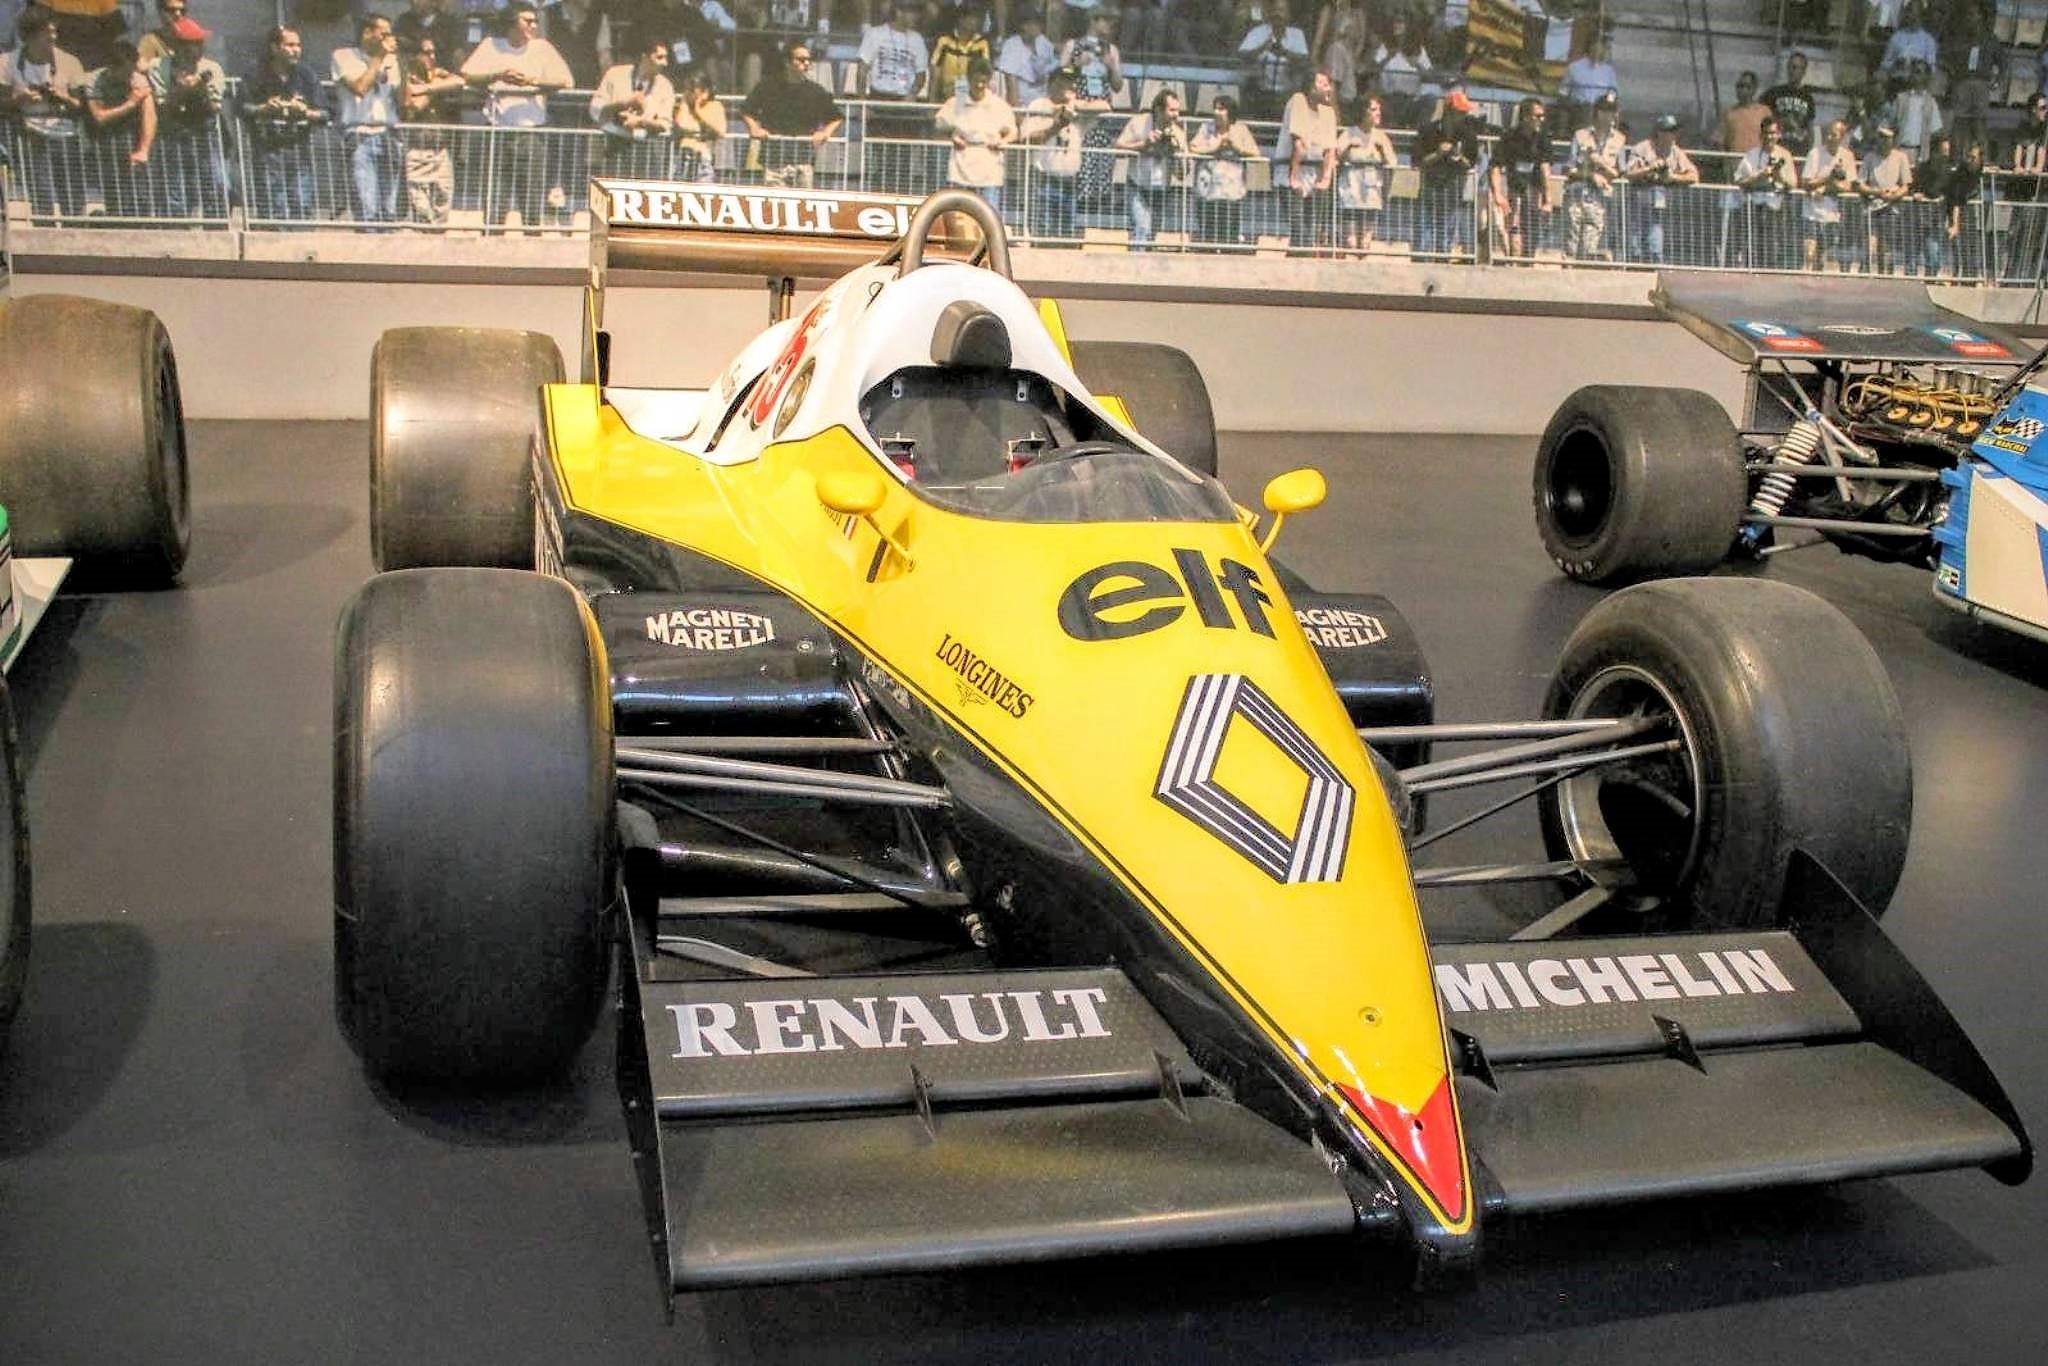 Renault ELF Type R40 1983